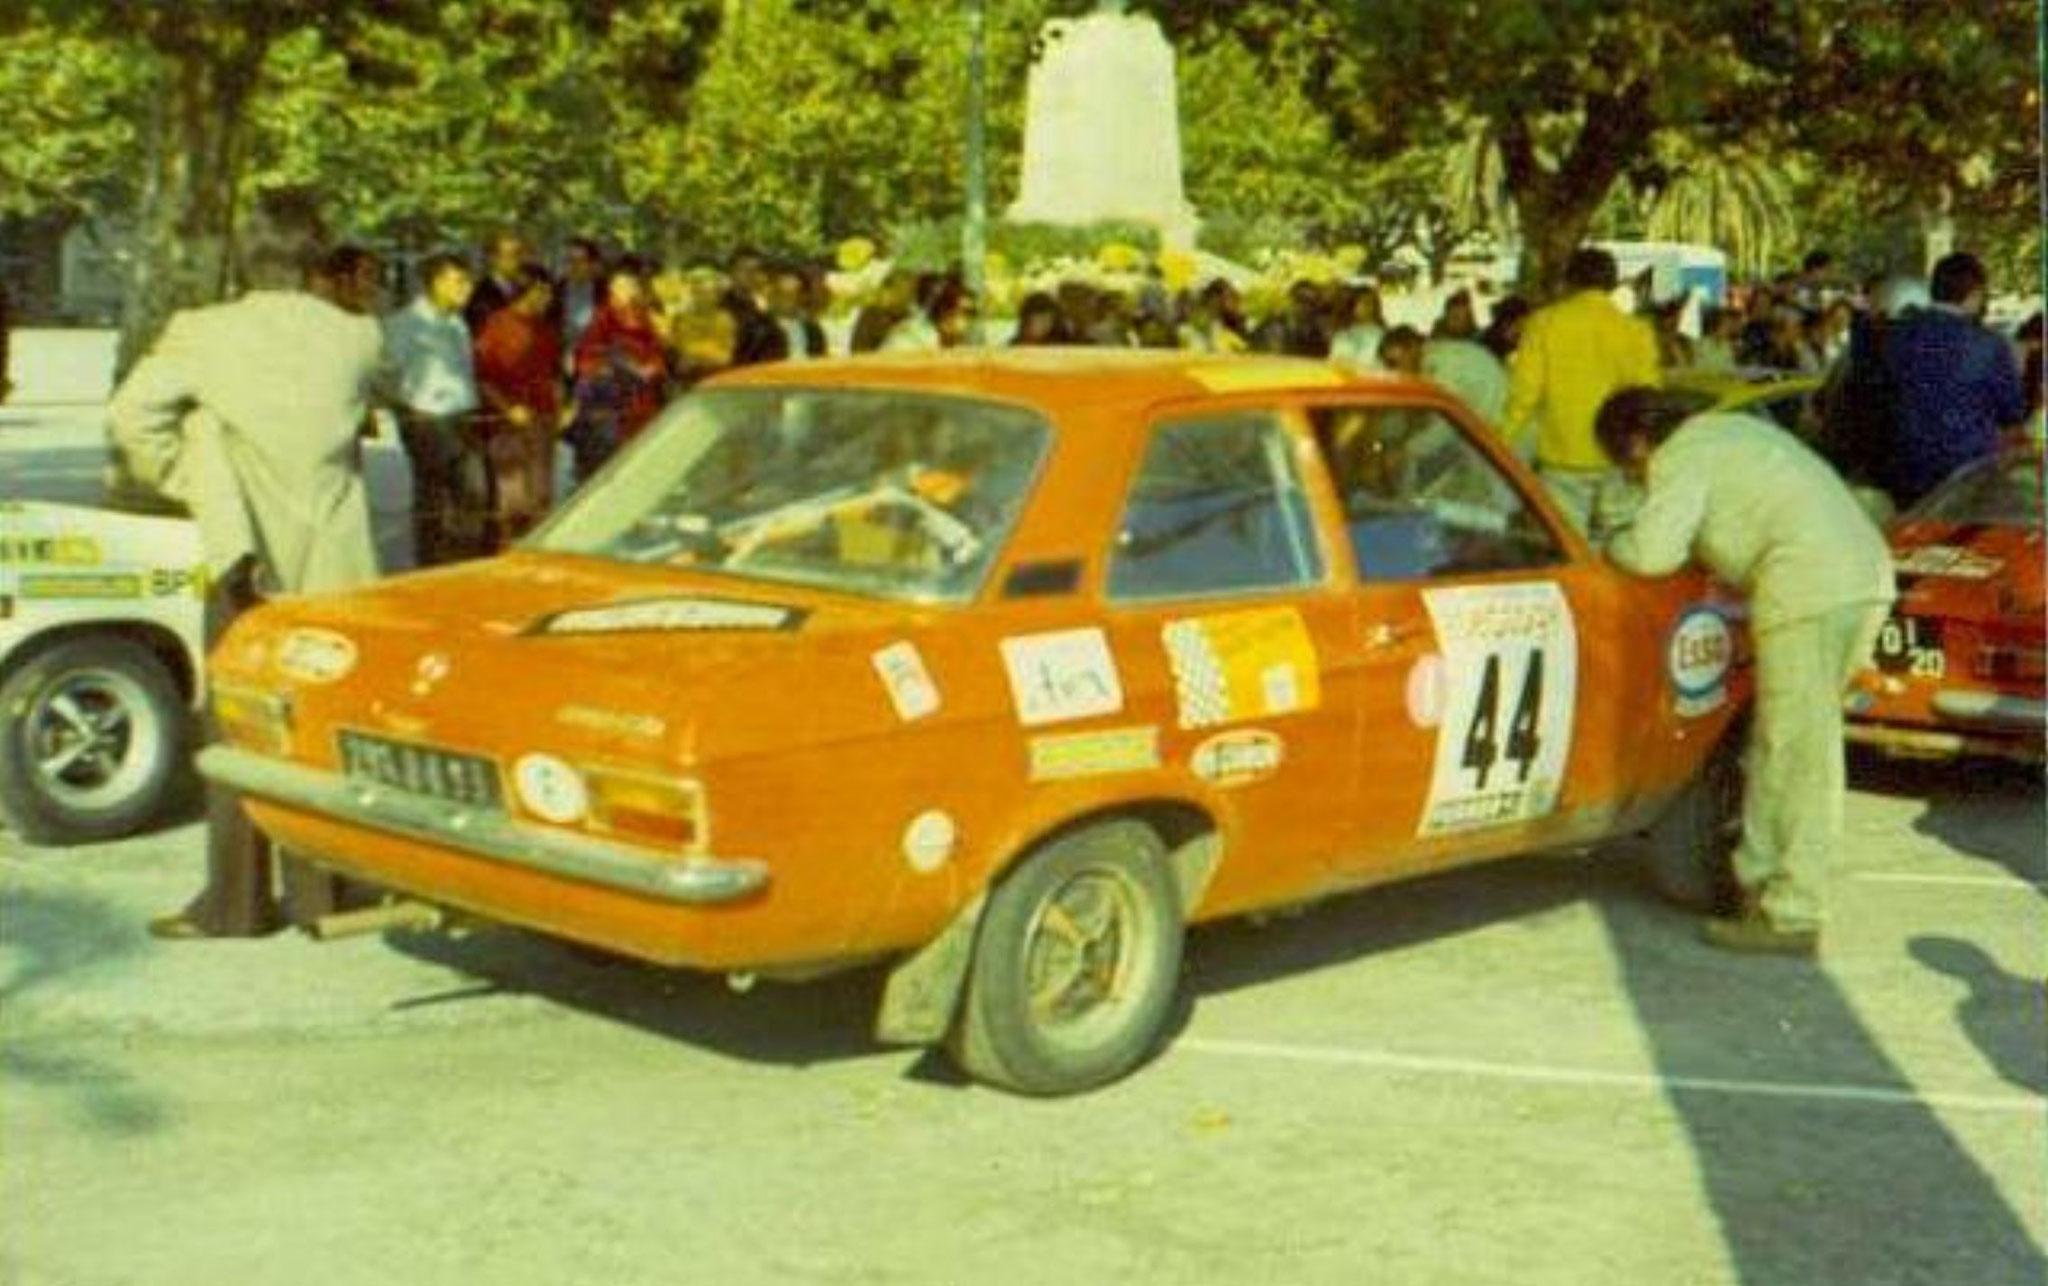 27 eme : FIAT-FIAT